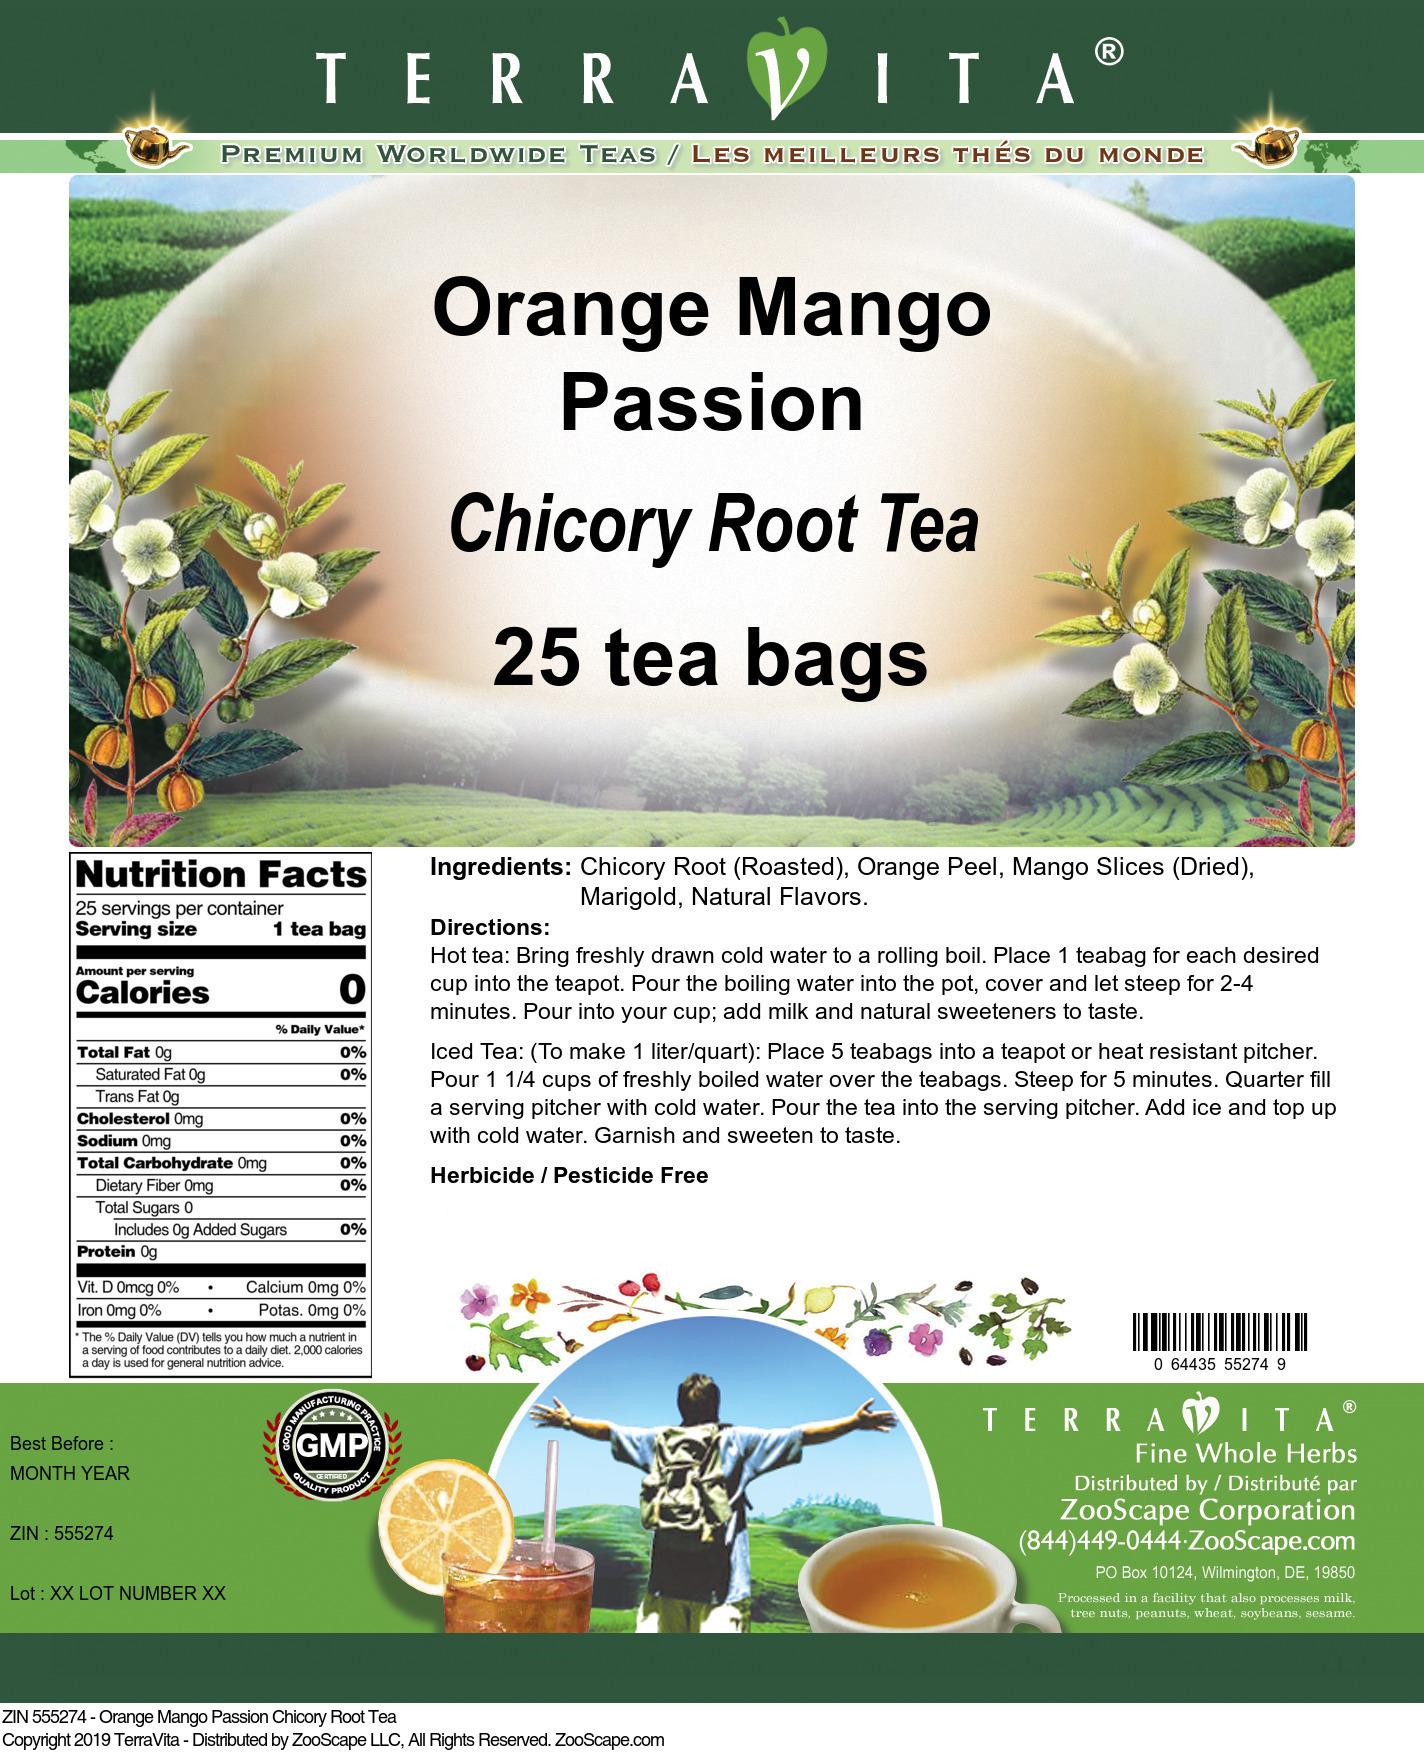 Orange Mango Passion Chicory Root